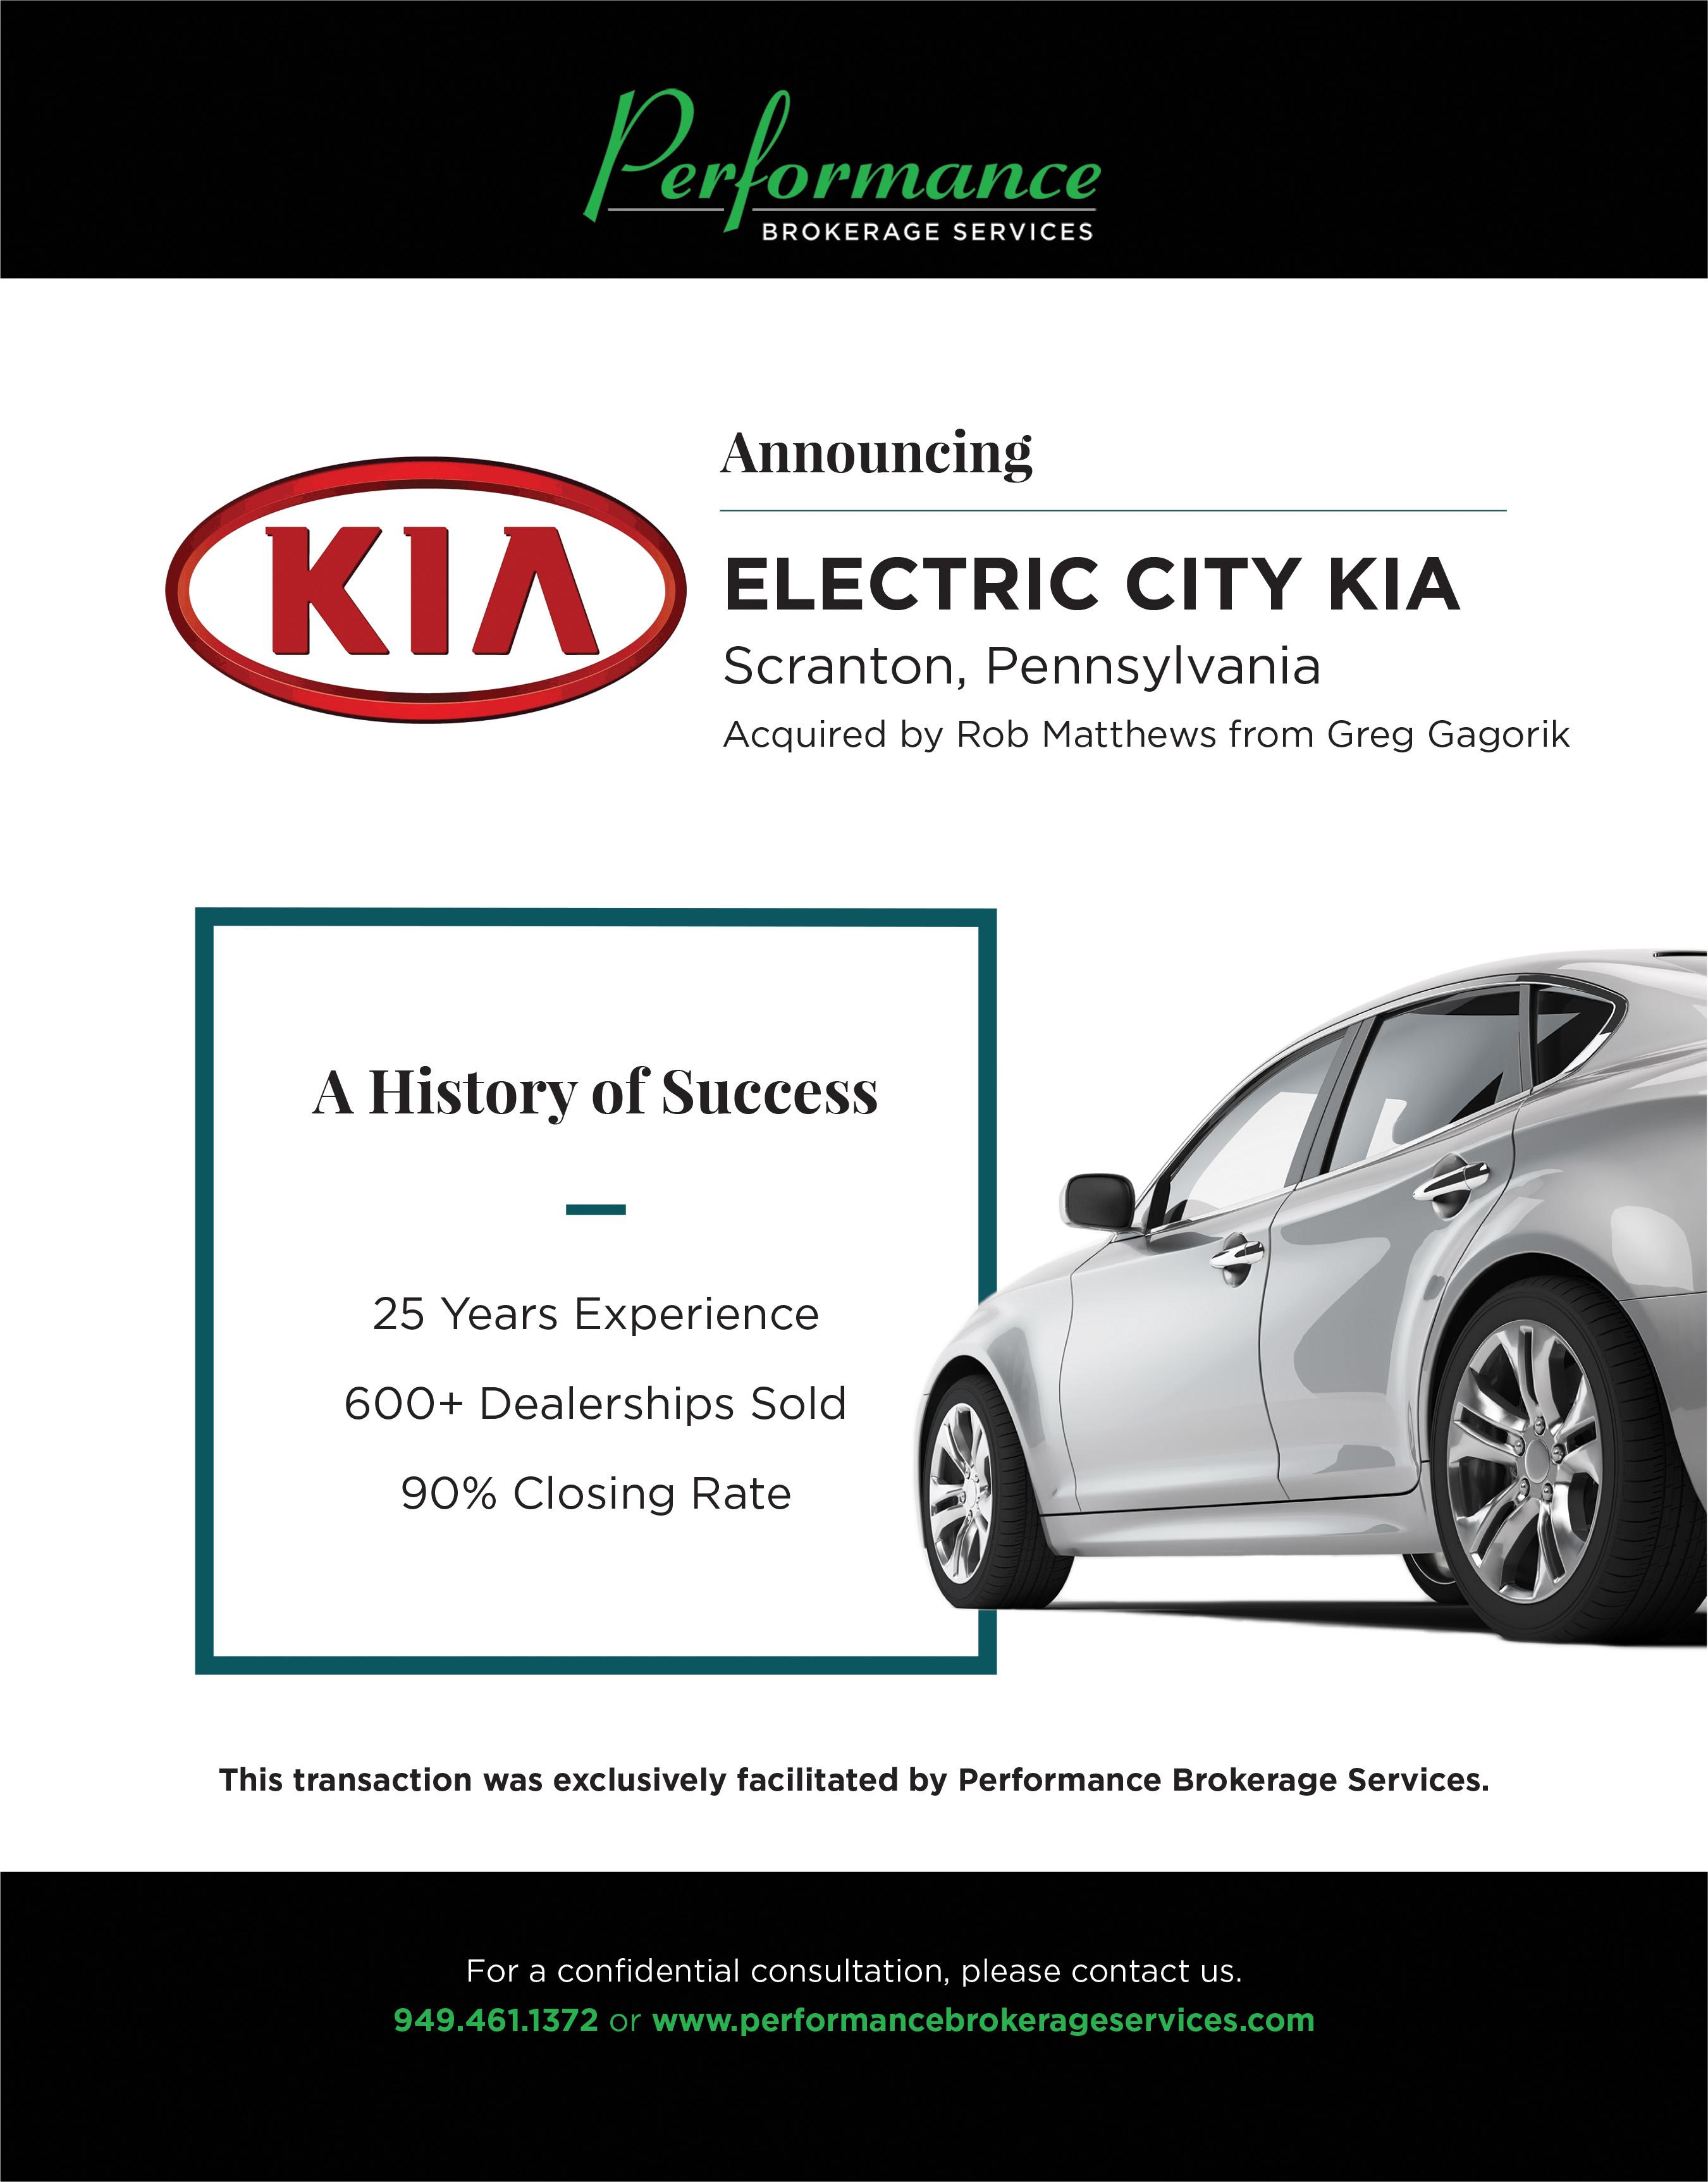 Greg Gagorik S Electric City Kia In Scranton Pennsylvania